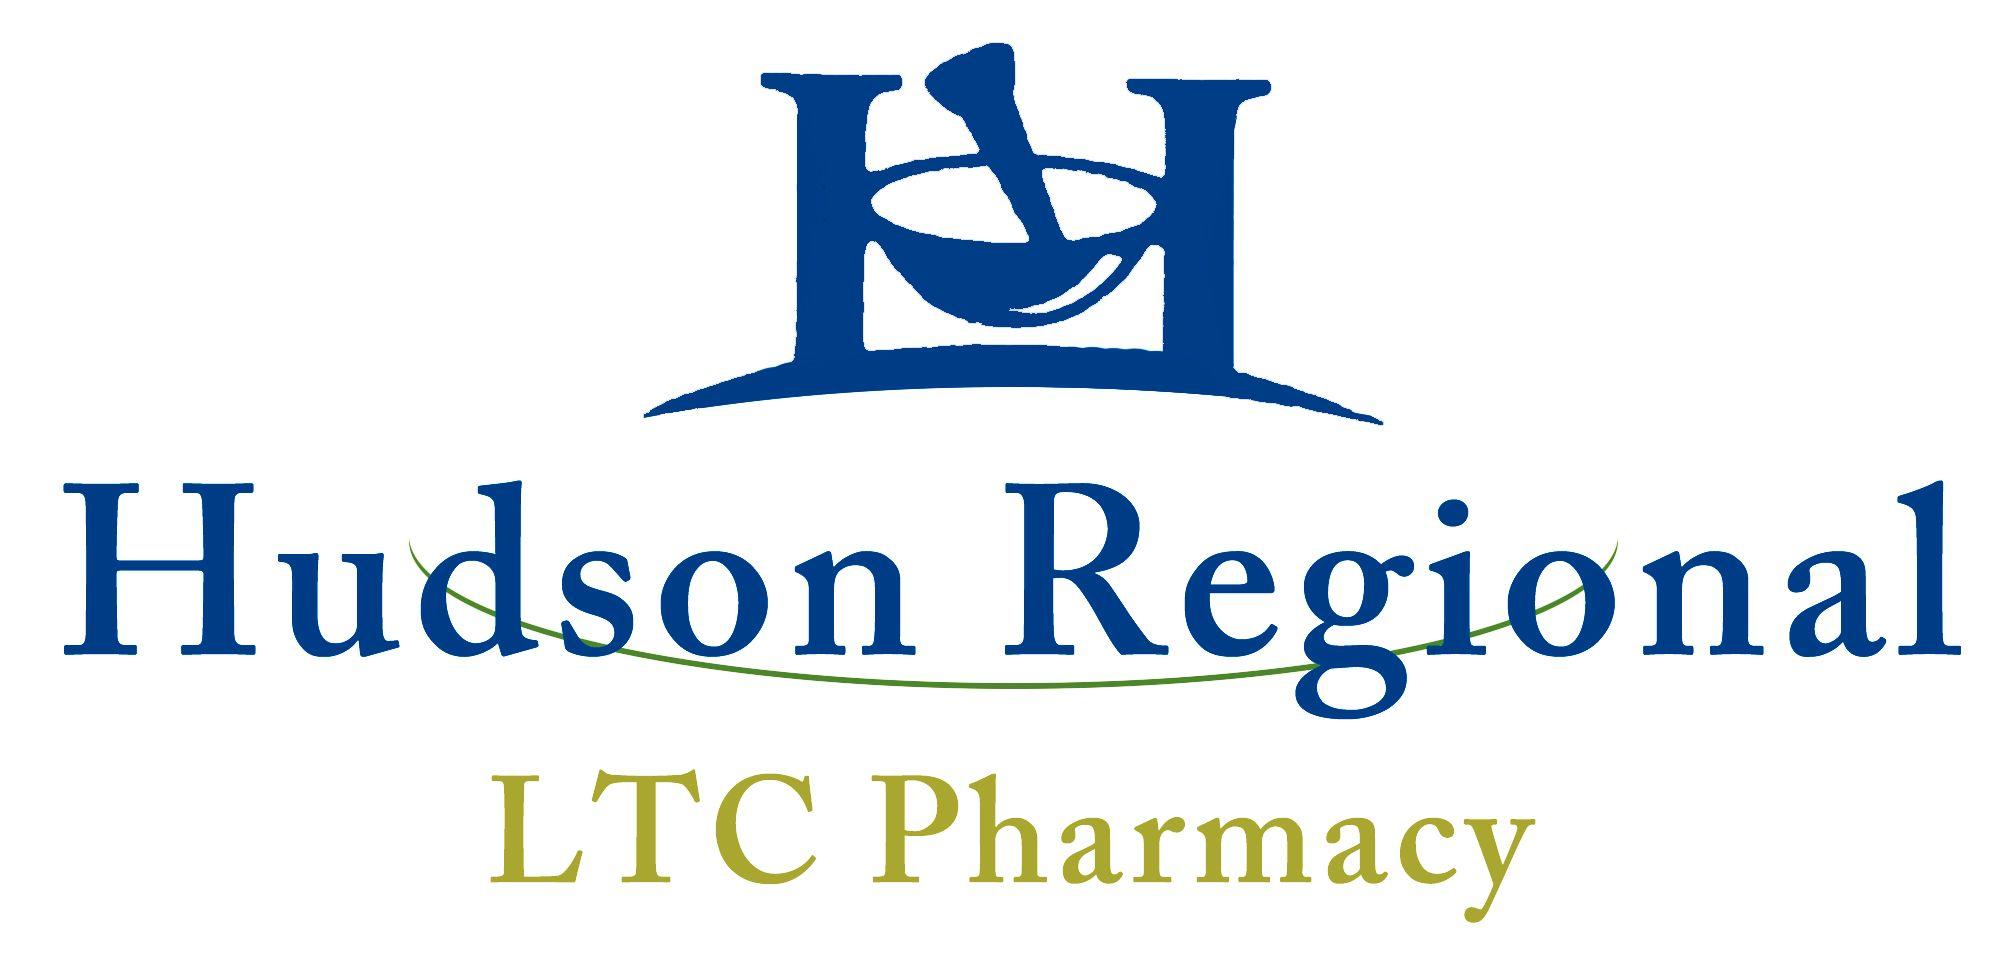 Hudson Regional LTC